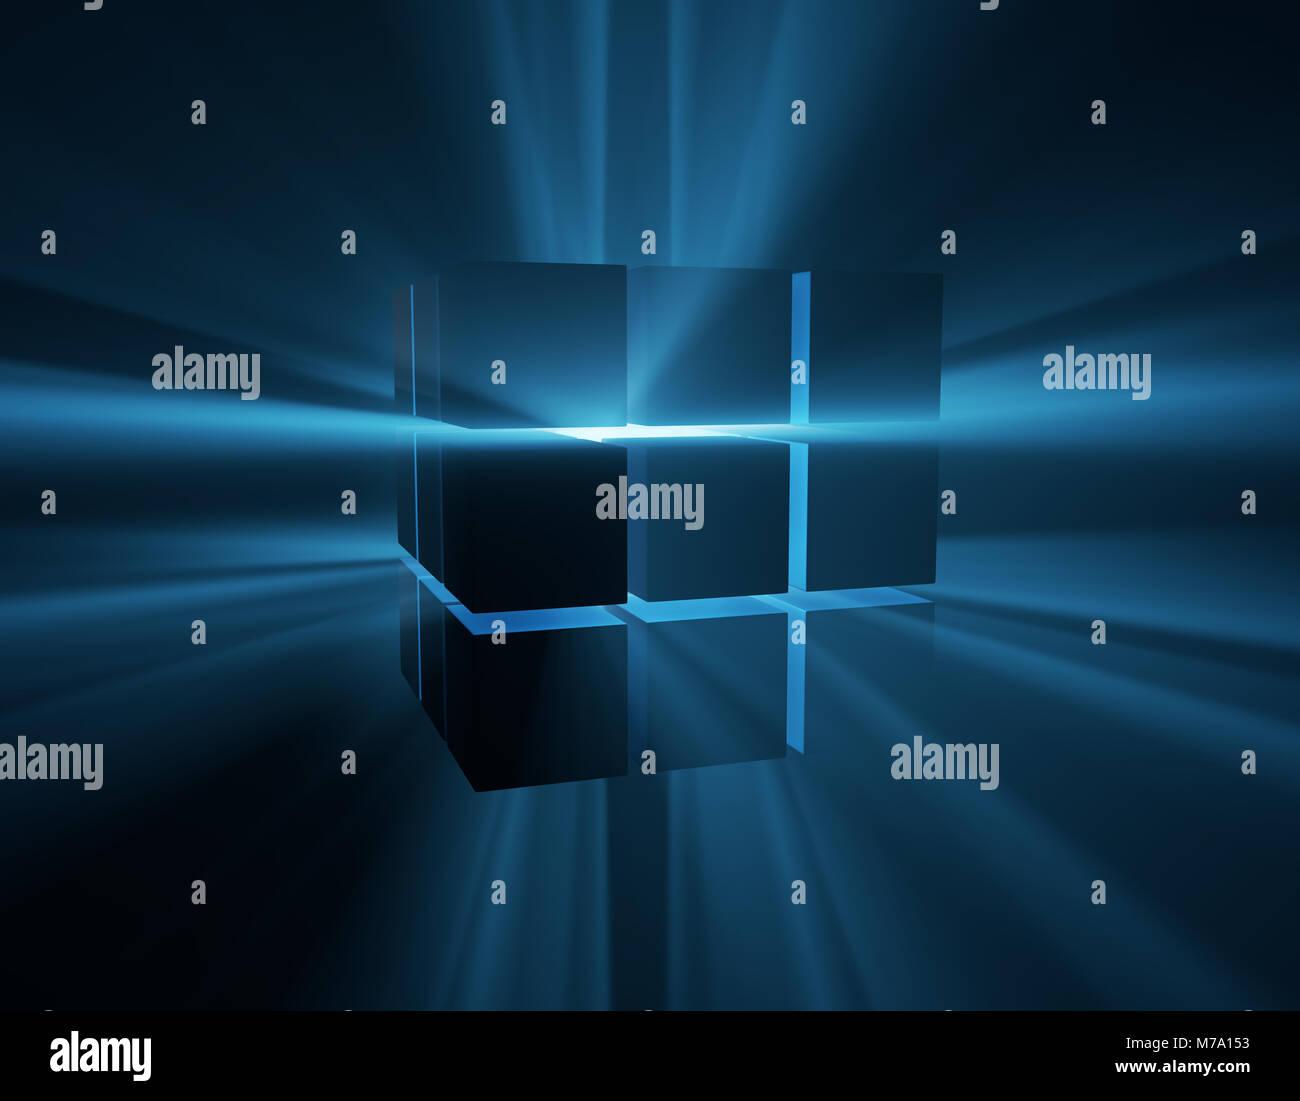 Network Future Technology, Data Transmission, Big Data Era, Programming - Stock Image